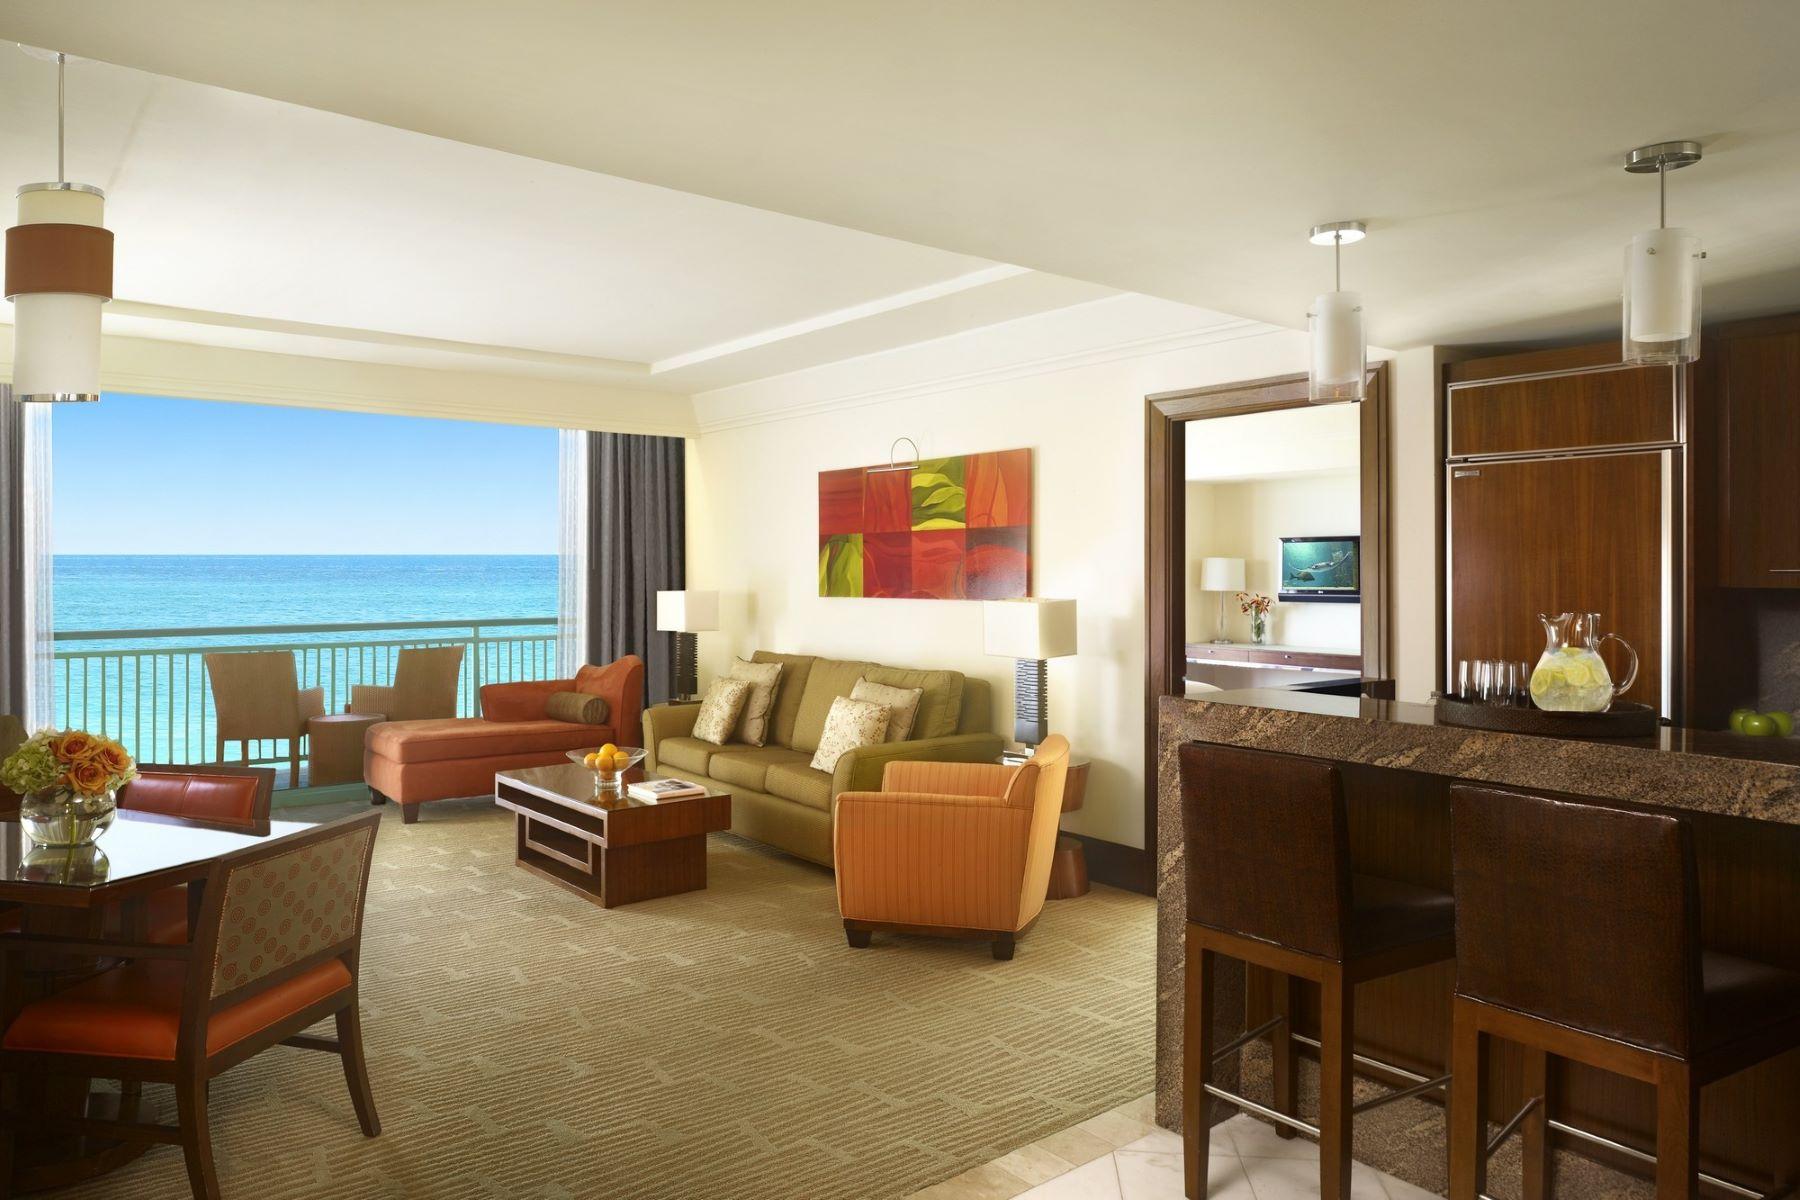 Condominium for Sale at The Reef 16-907 The Reef At Atlantis, Paradise Island, Nassau And Paradise Island Bahamas